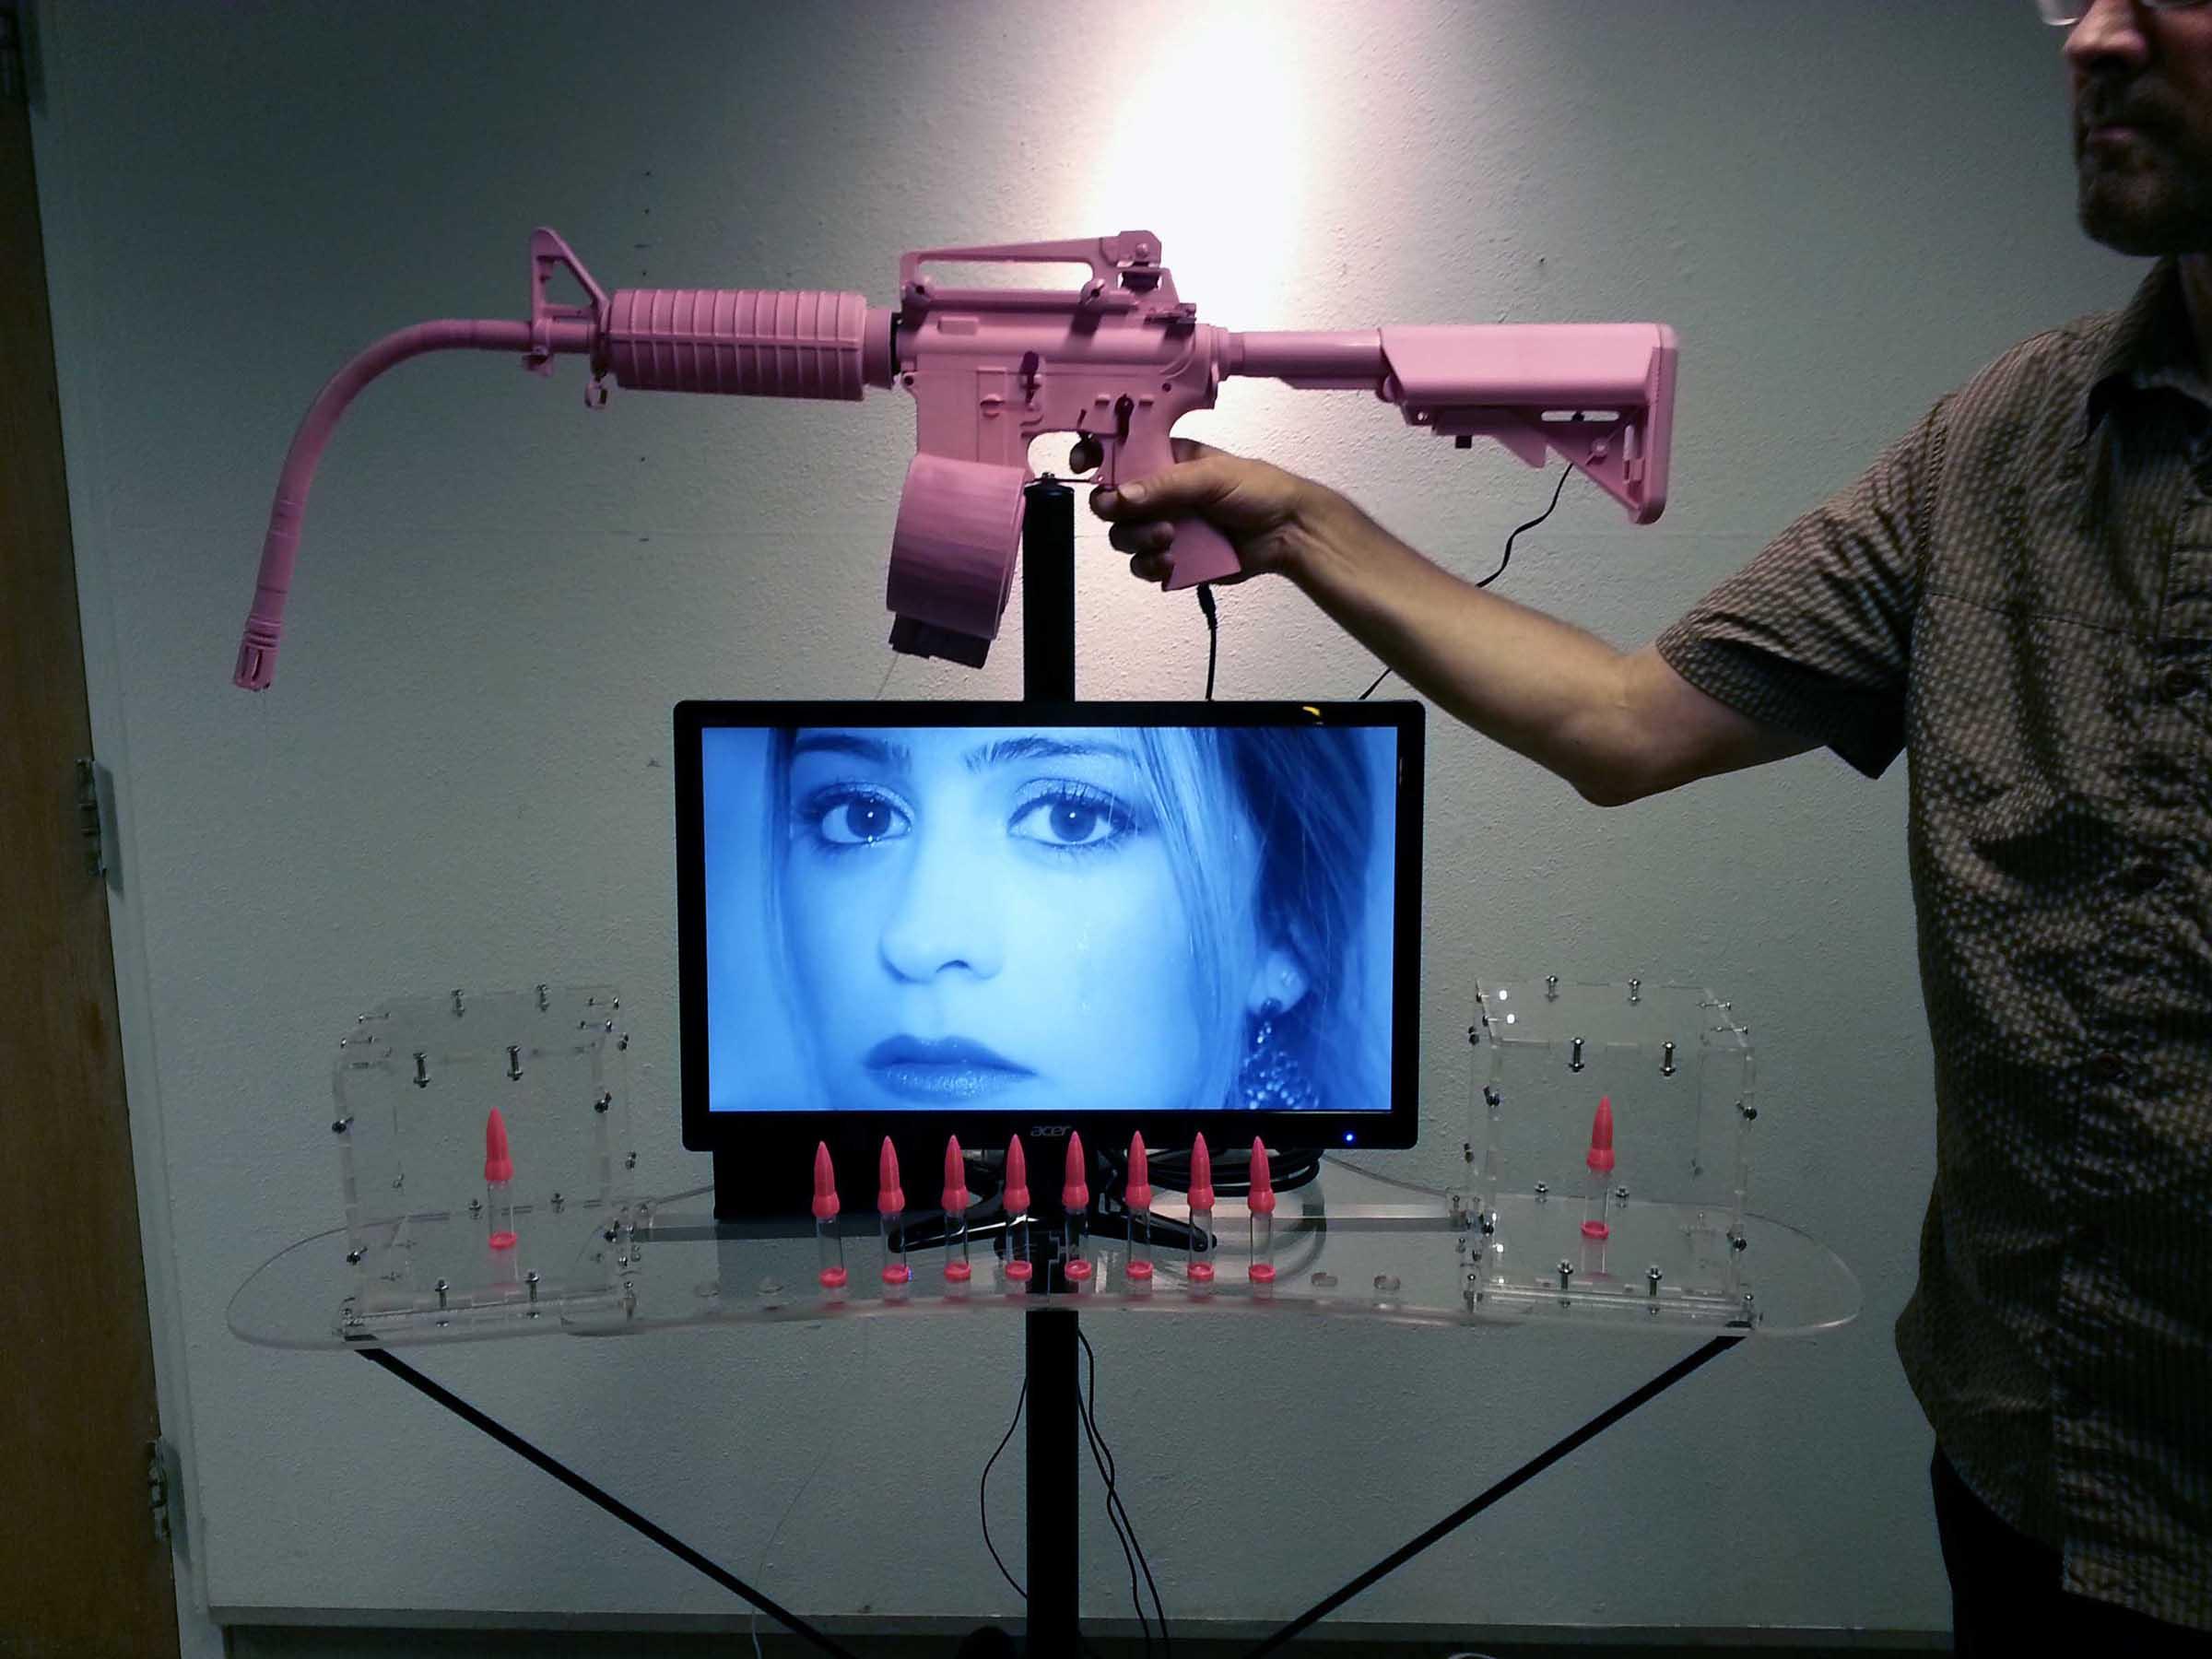 The Womans Tears Machine Gun by Ken Rinaldo pink gun